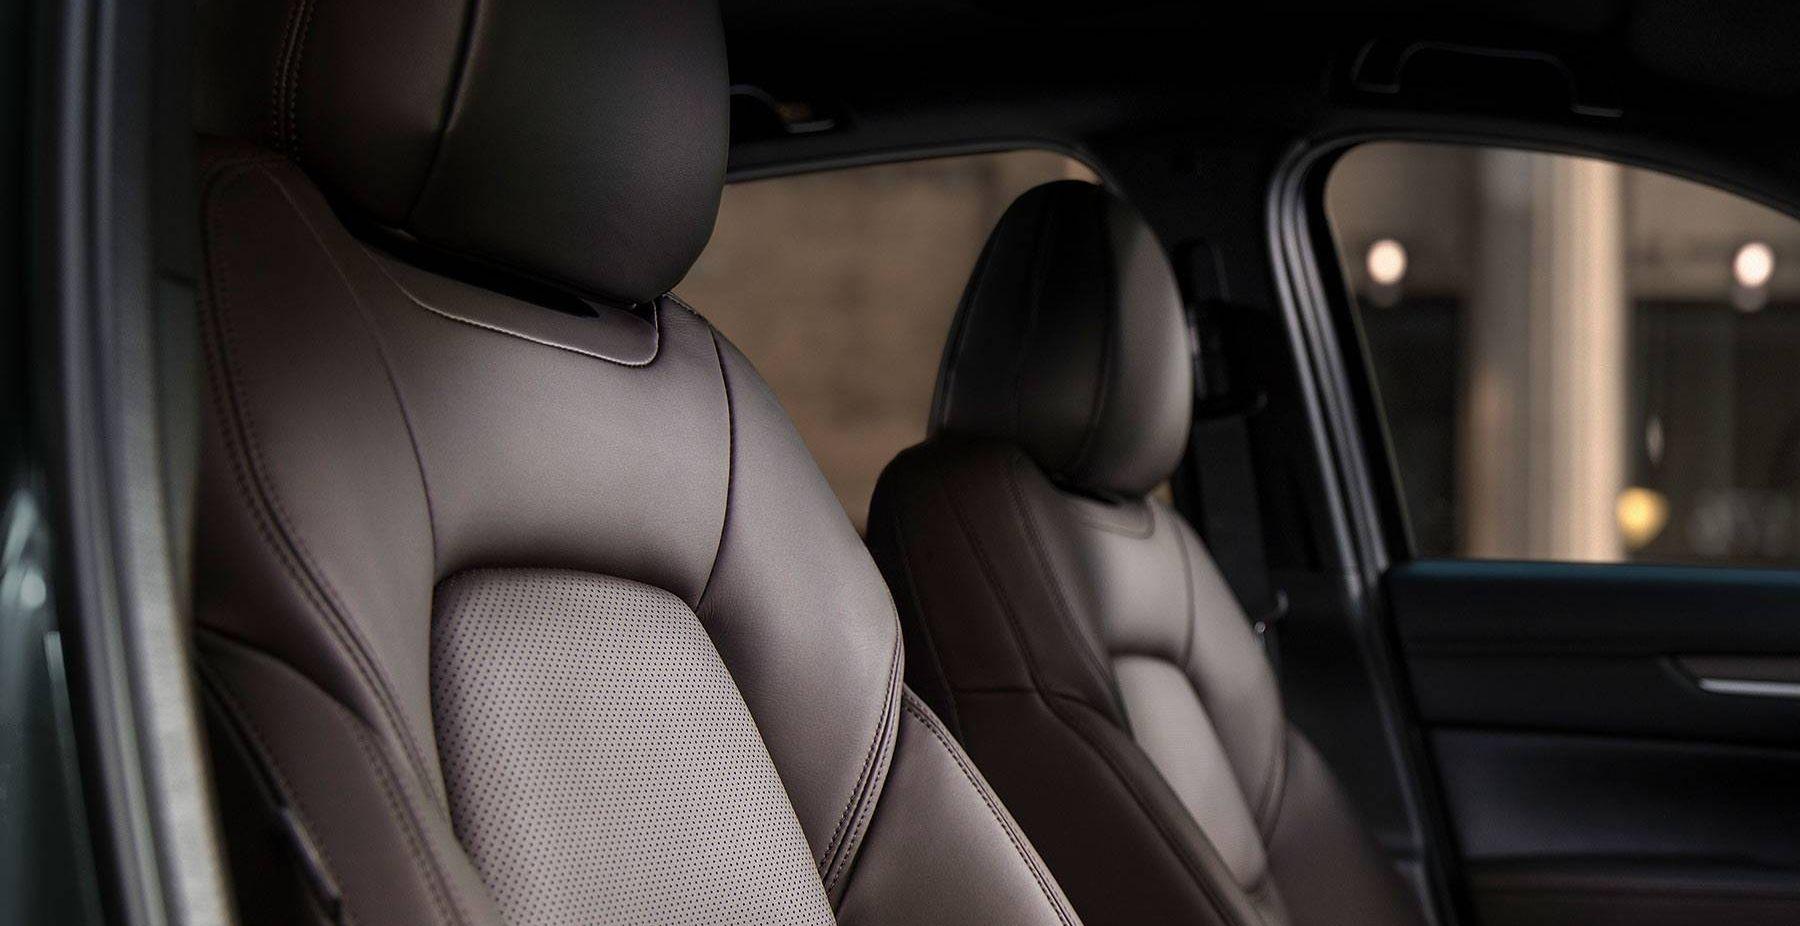 Cozy Seats in the 2019 Mazda CX-5